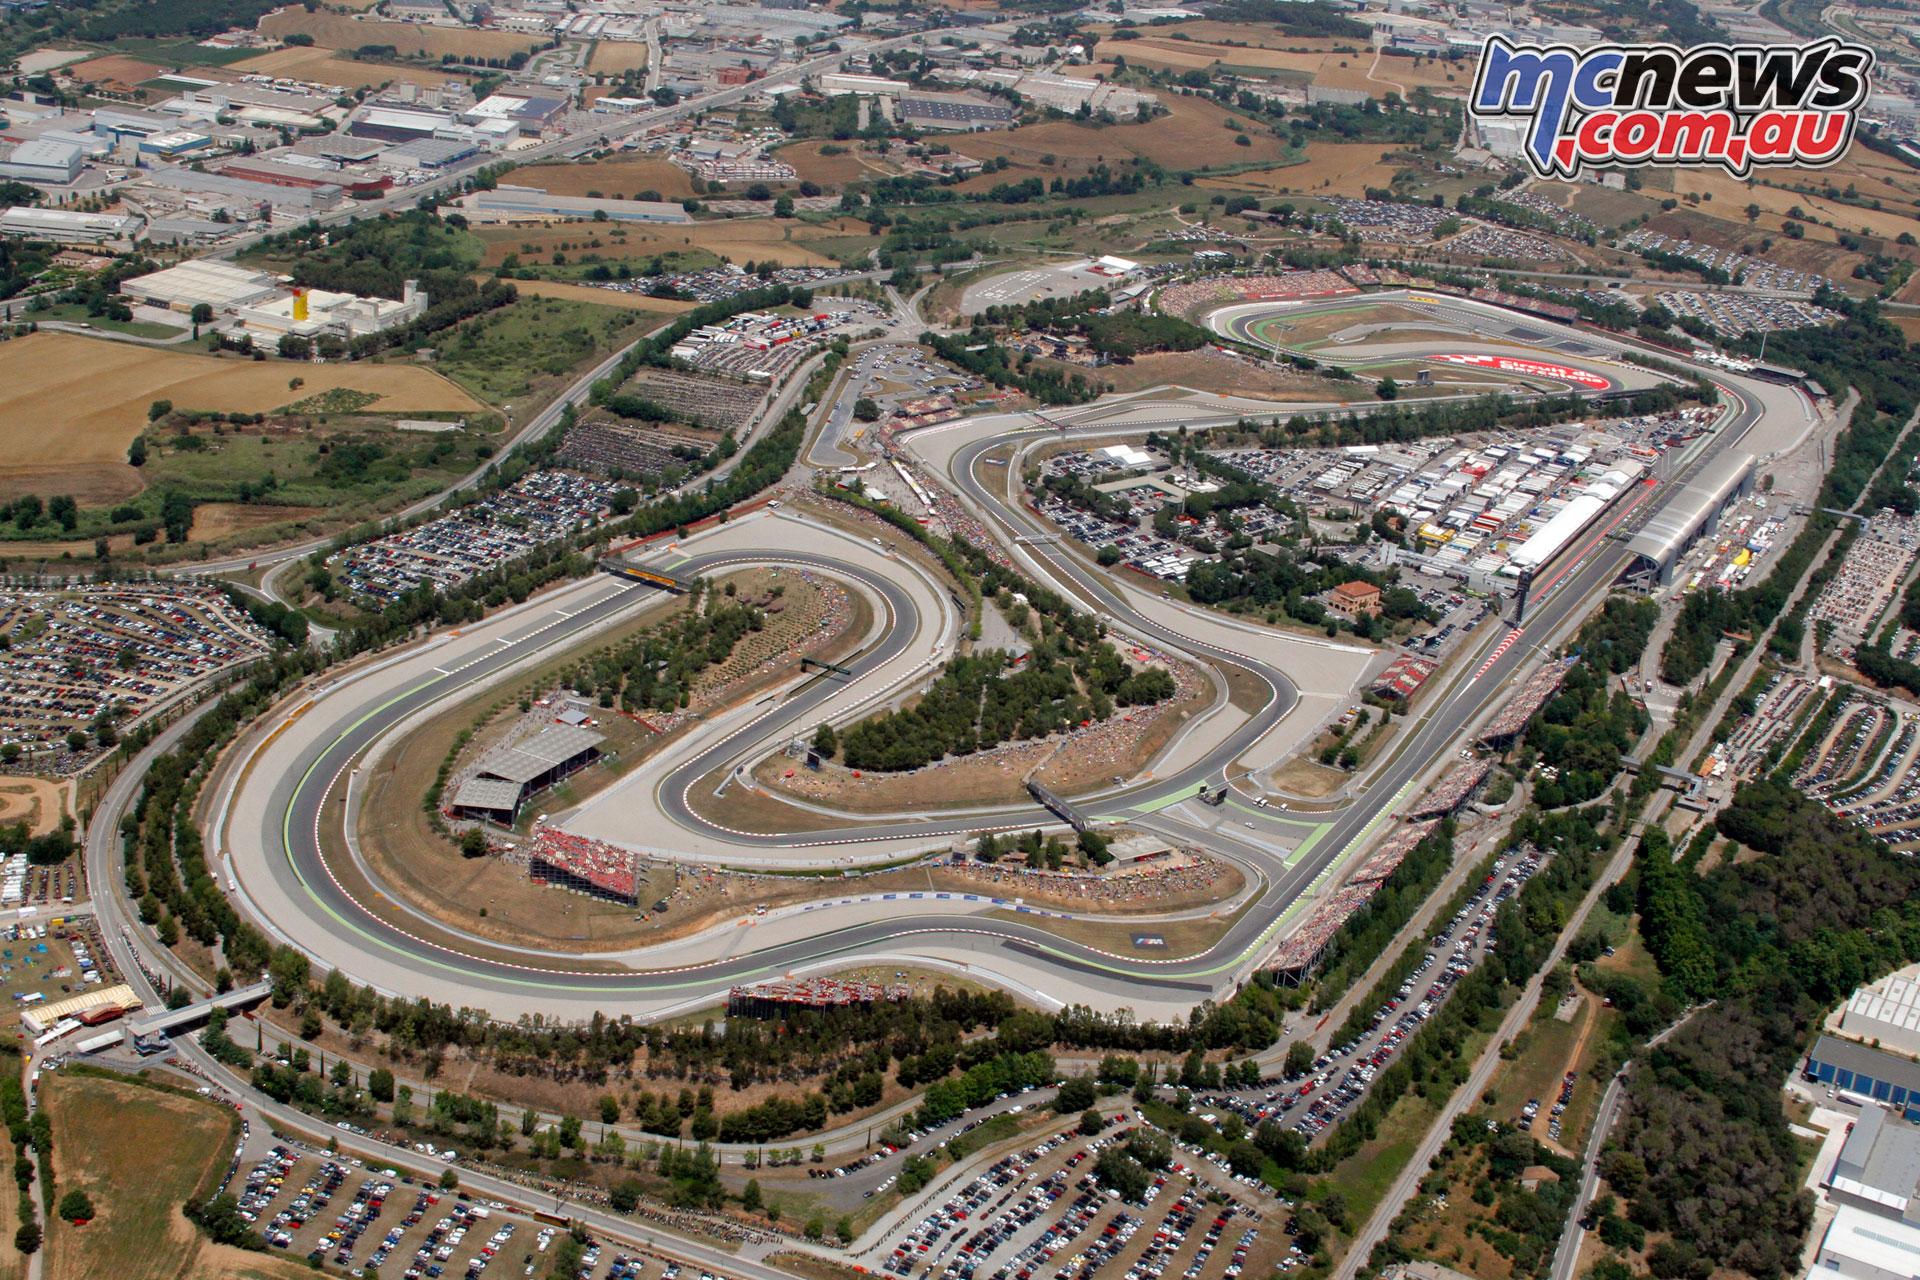 Motogp Heads To Circuit De Barcelona Catalunya Mcnews Com Au